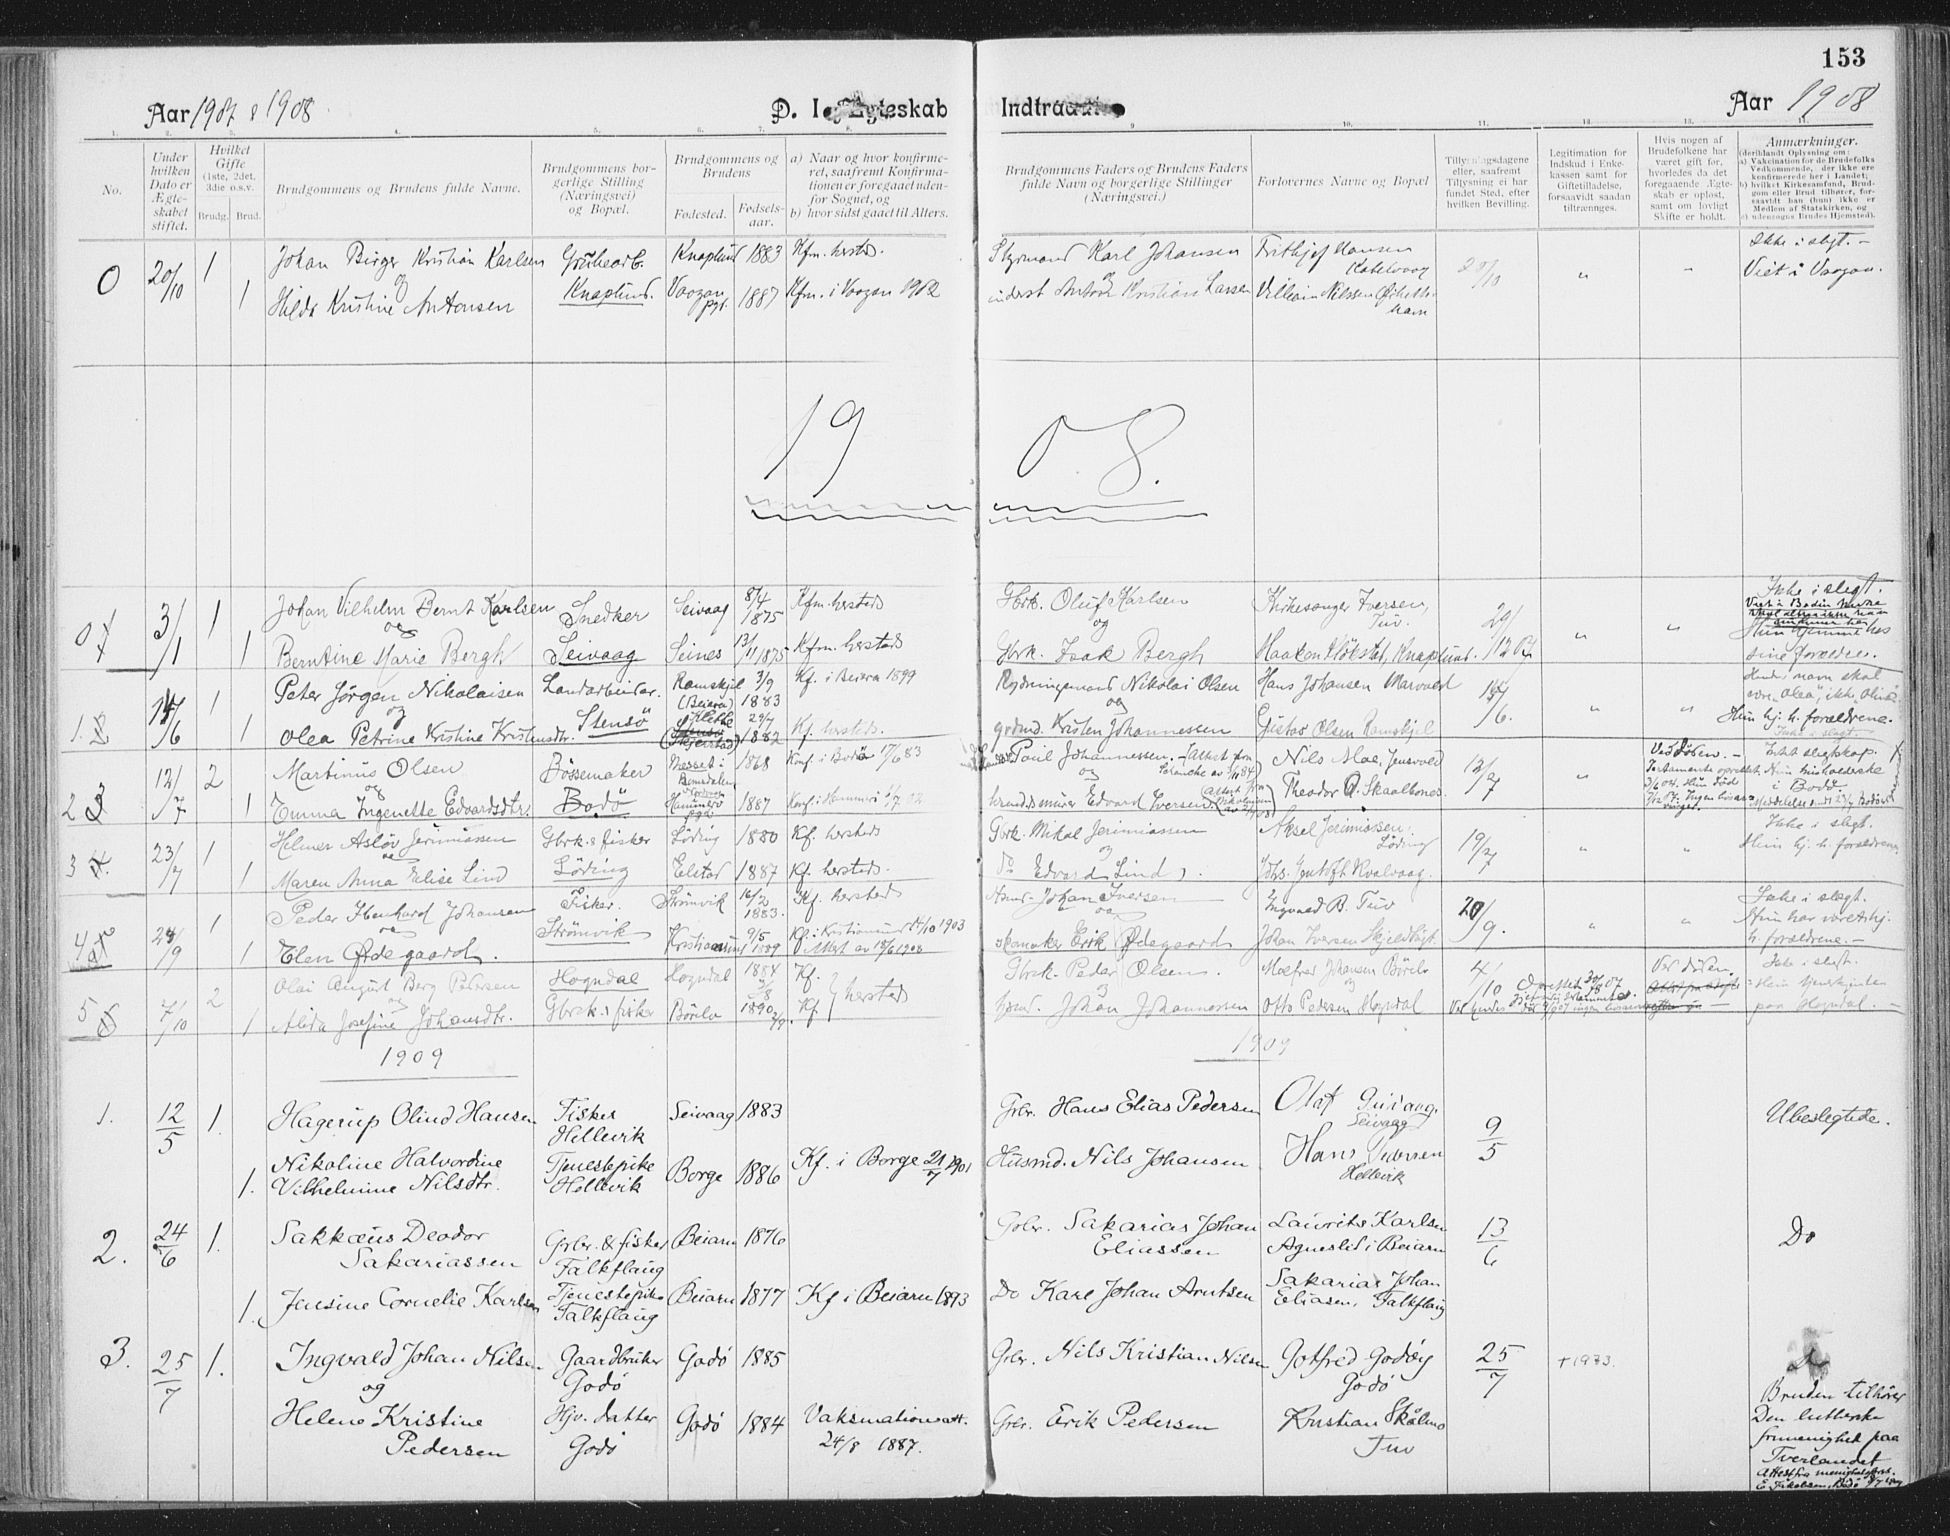 SAT, Ministerialprotokoller, klokkerbøker og fødselsregistre - Nordland, 804/L0081: Ministerialbok nr. 804A02, 1901-1915, s. 153